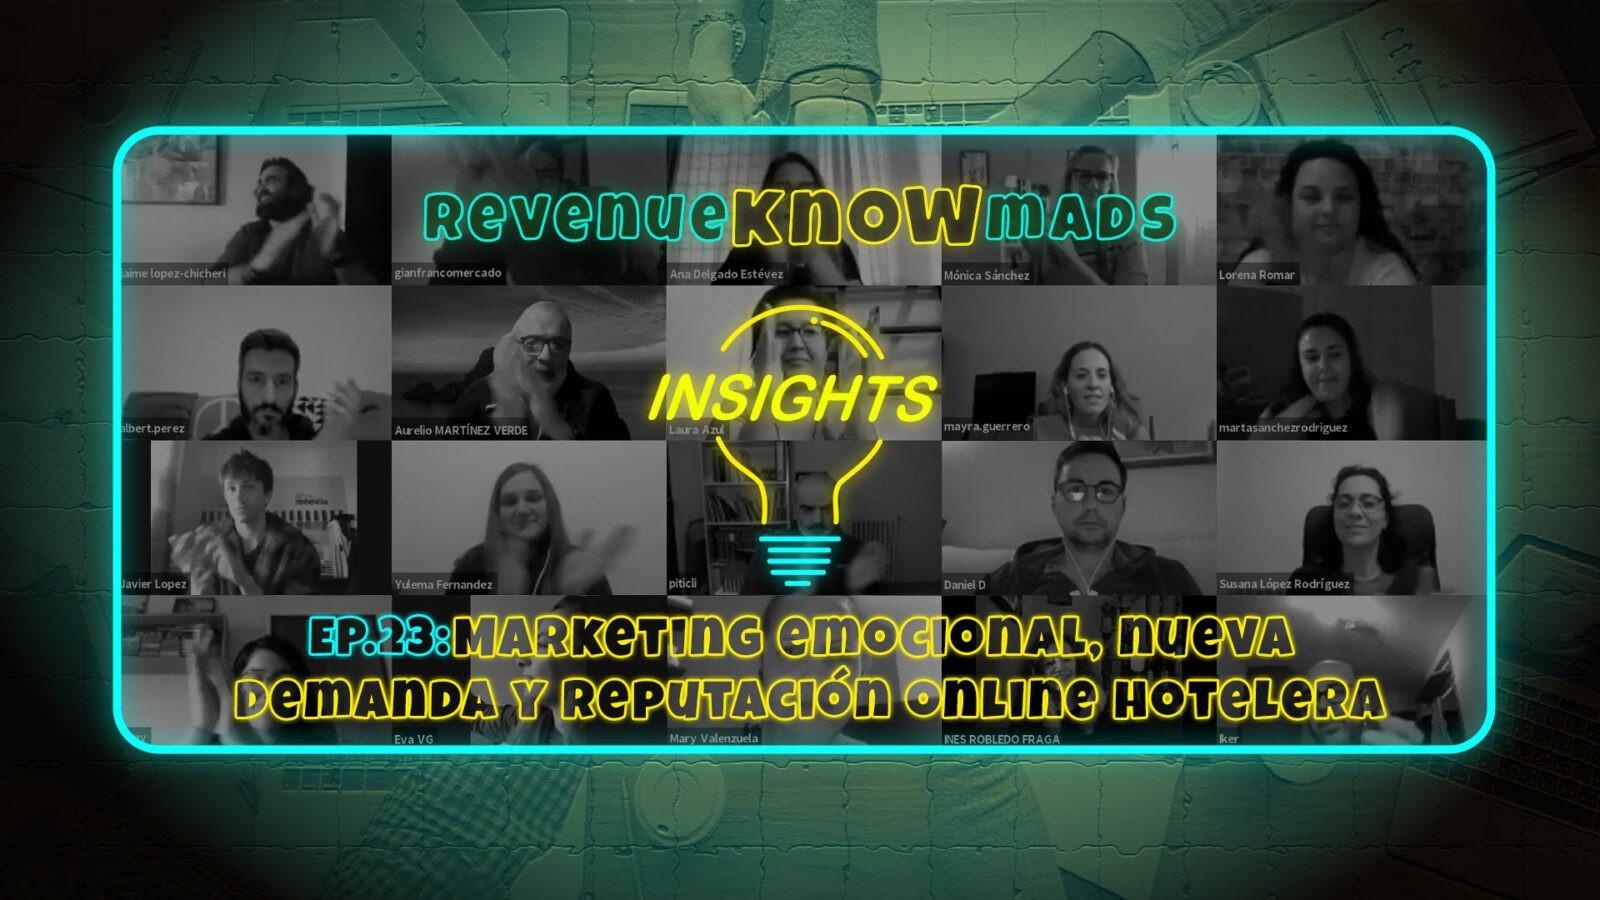 RevenueKnowmads Insights - Ep.23